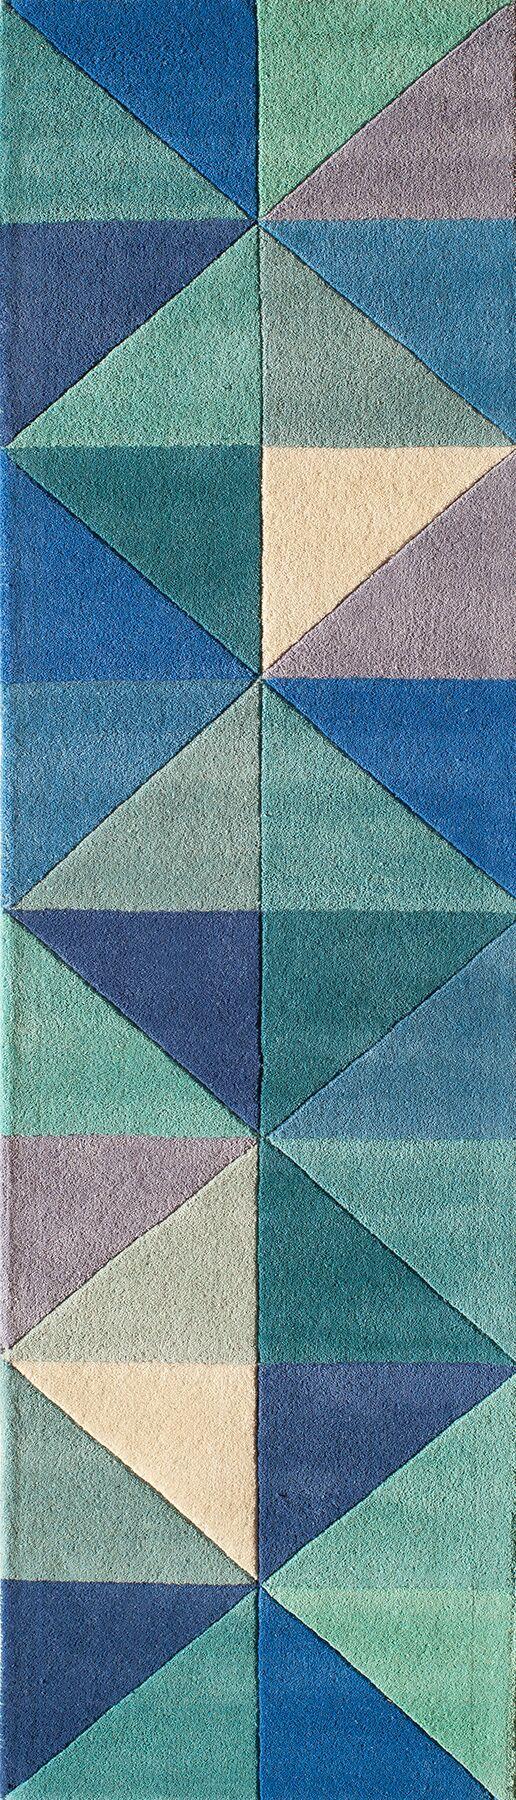 Carmel Hand-Tufted Blue Area Rug Rug Size: Rectangle 5' x 8'